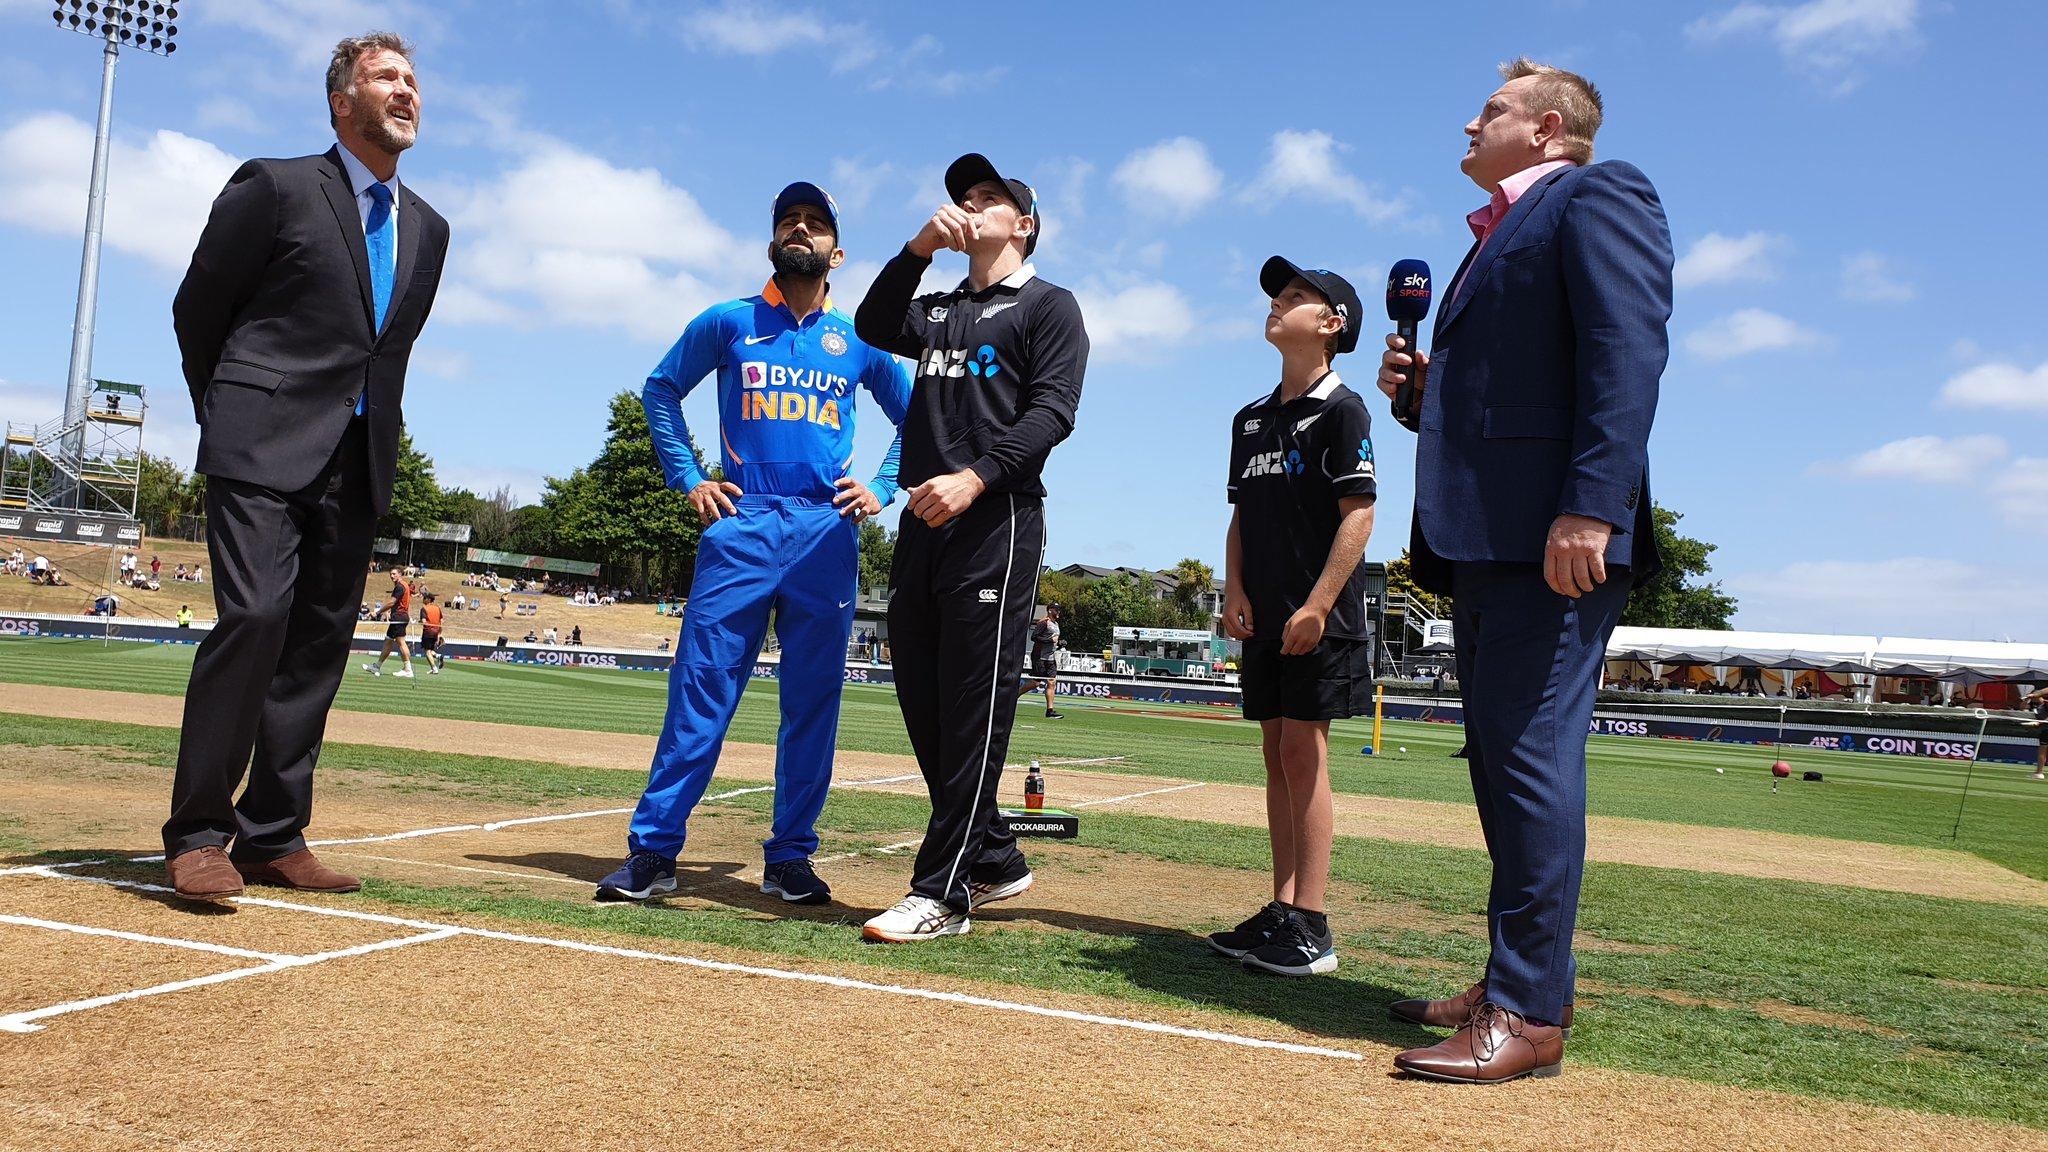 Virat Kohli 's huge mistake led to Team India's series loss against the Kiwis